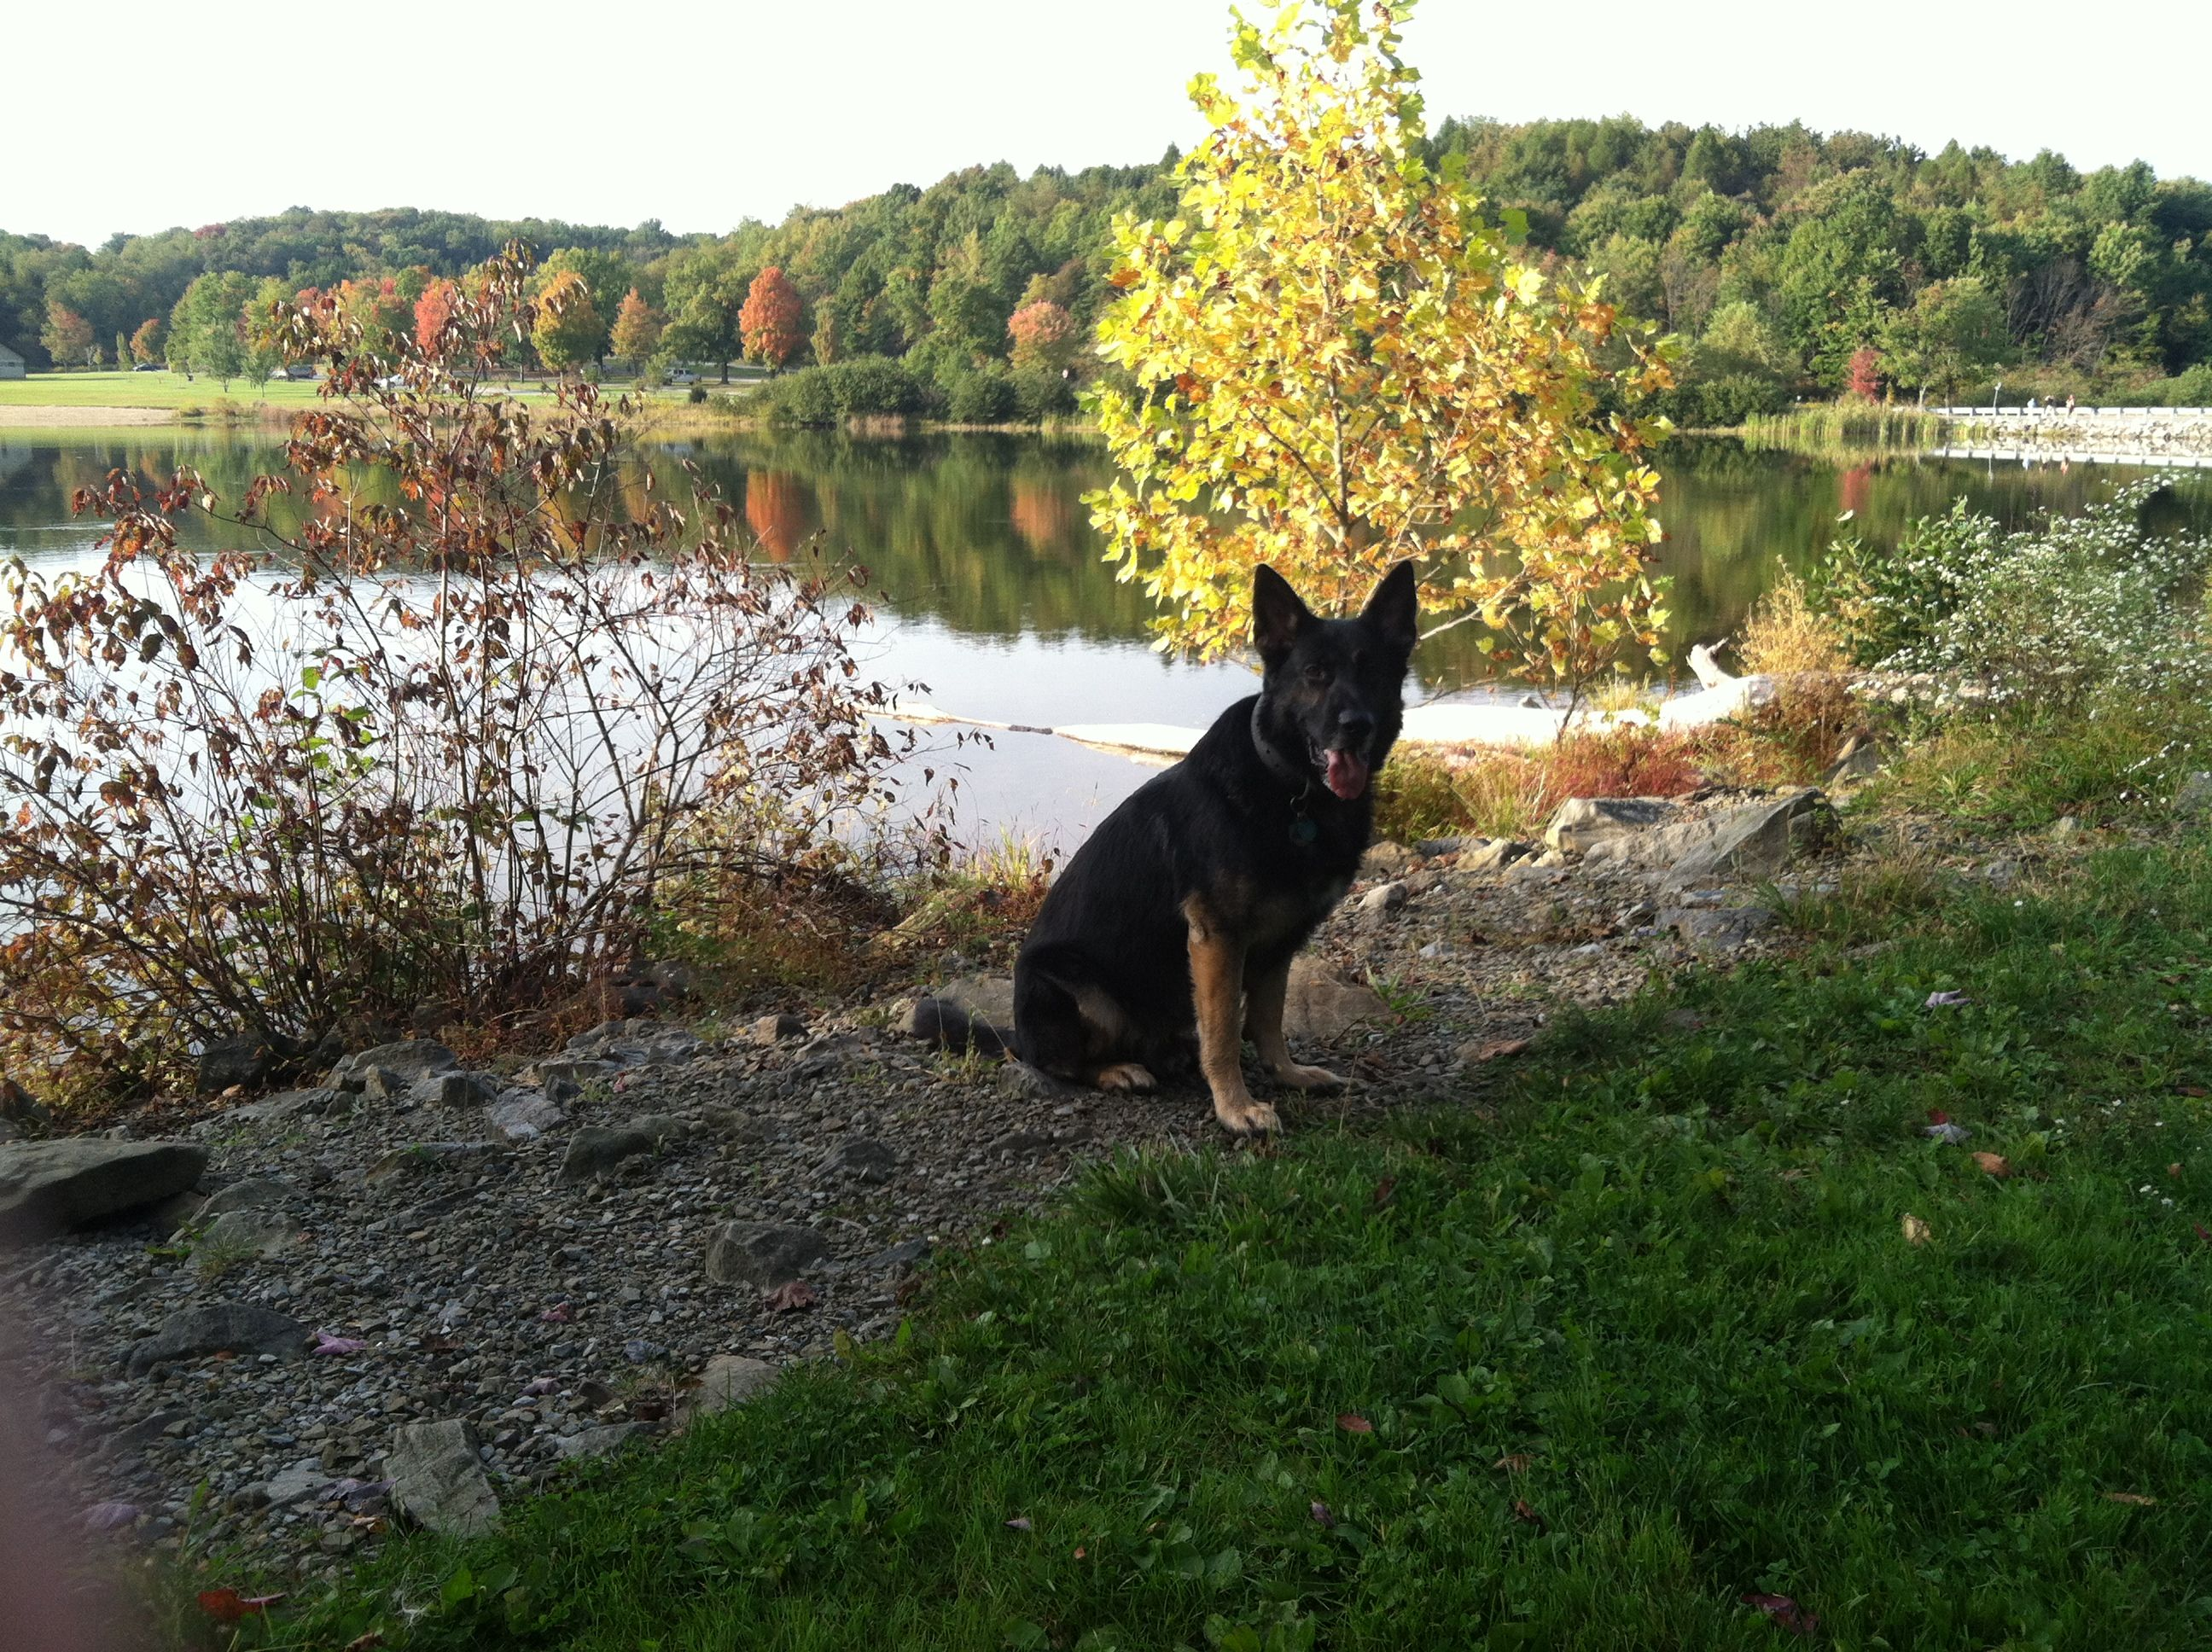 Greater Allegheny Passage Summer 2013 German Shepherd Dog Hiking